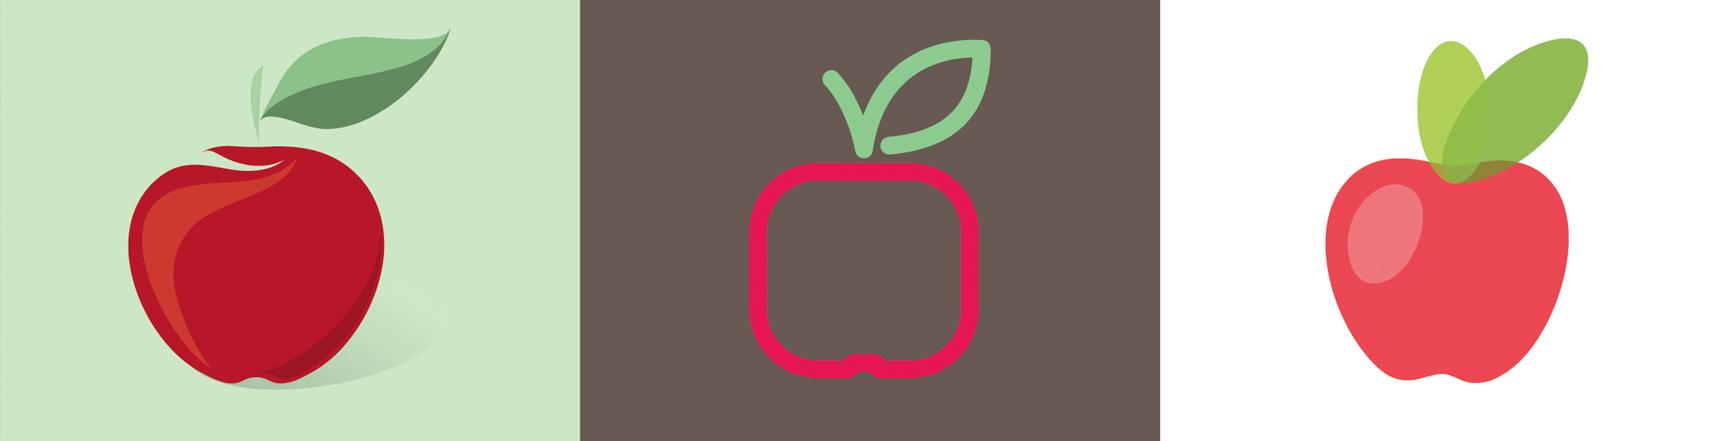 Apple_Resources2.jpg